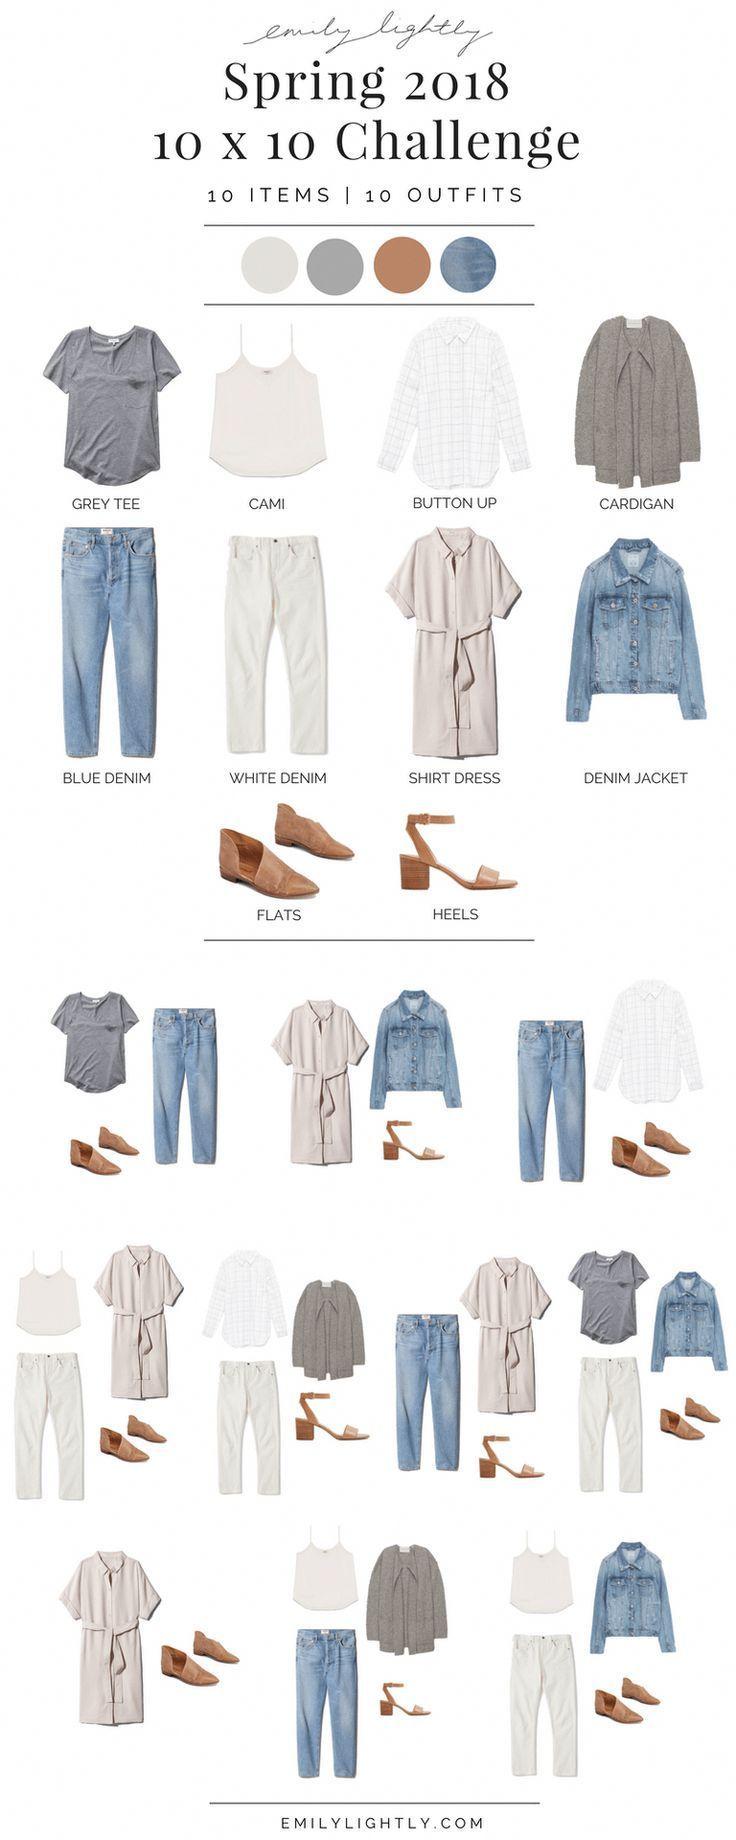 Spring 2018 10 x 10 challenge recap - Emily Lightly // minimalist style, capsule wardrobe, slow fashion  fashionclothes